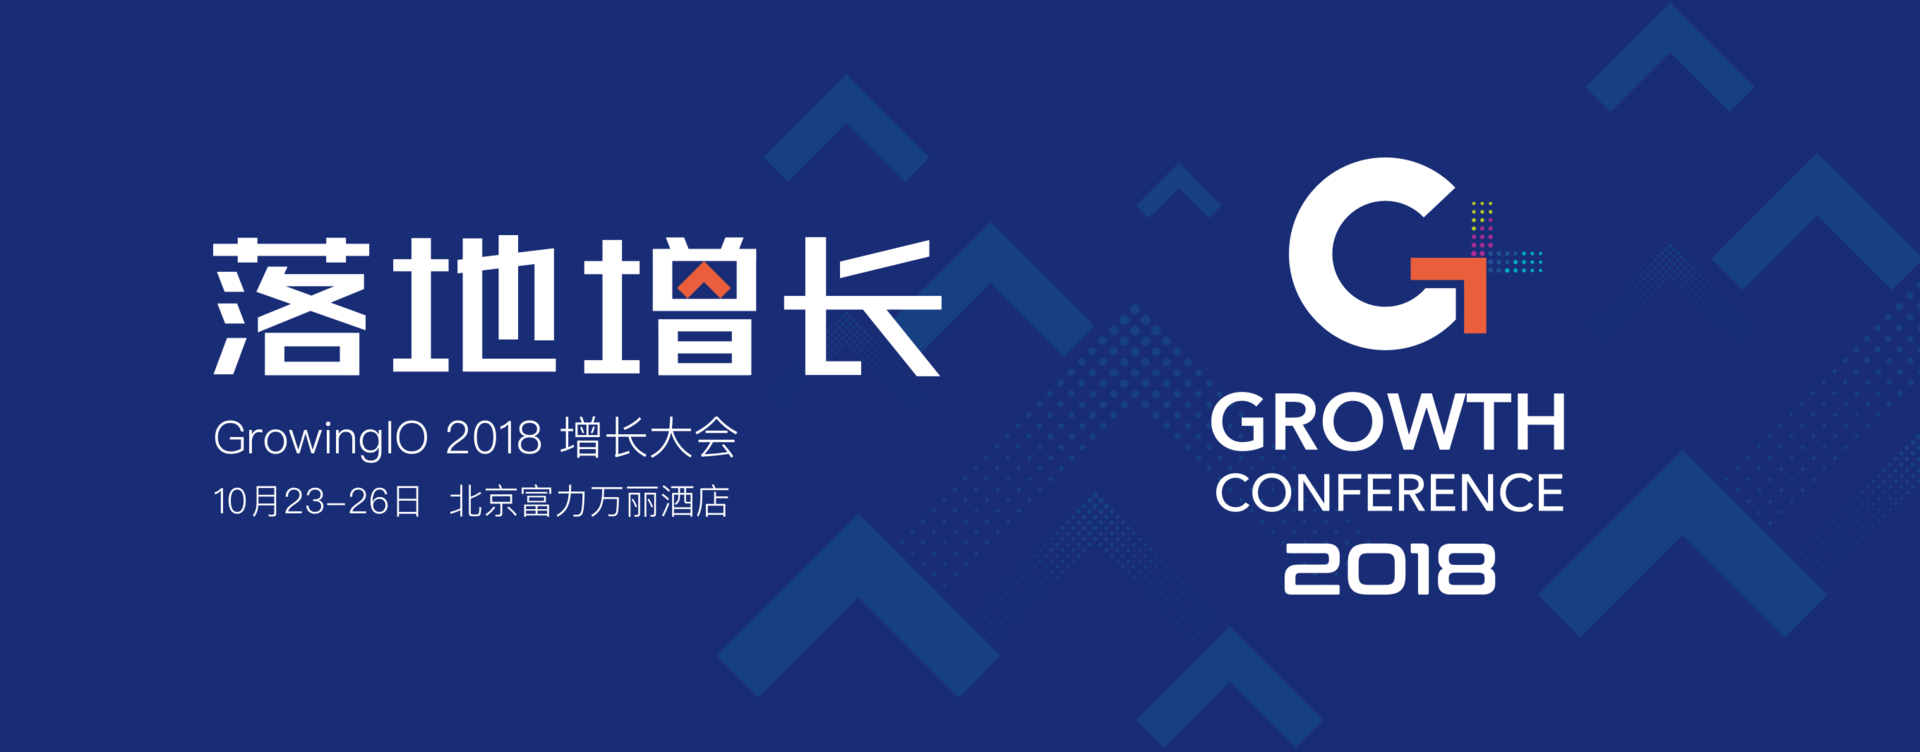 GrowingIO 2018 增长大会 - 落地增长